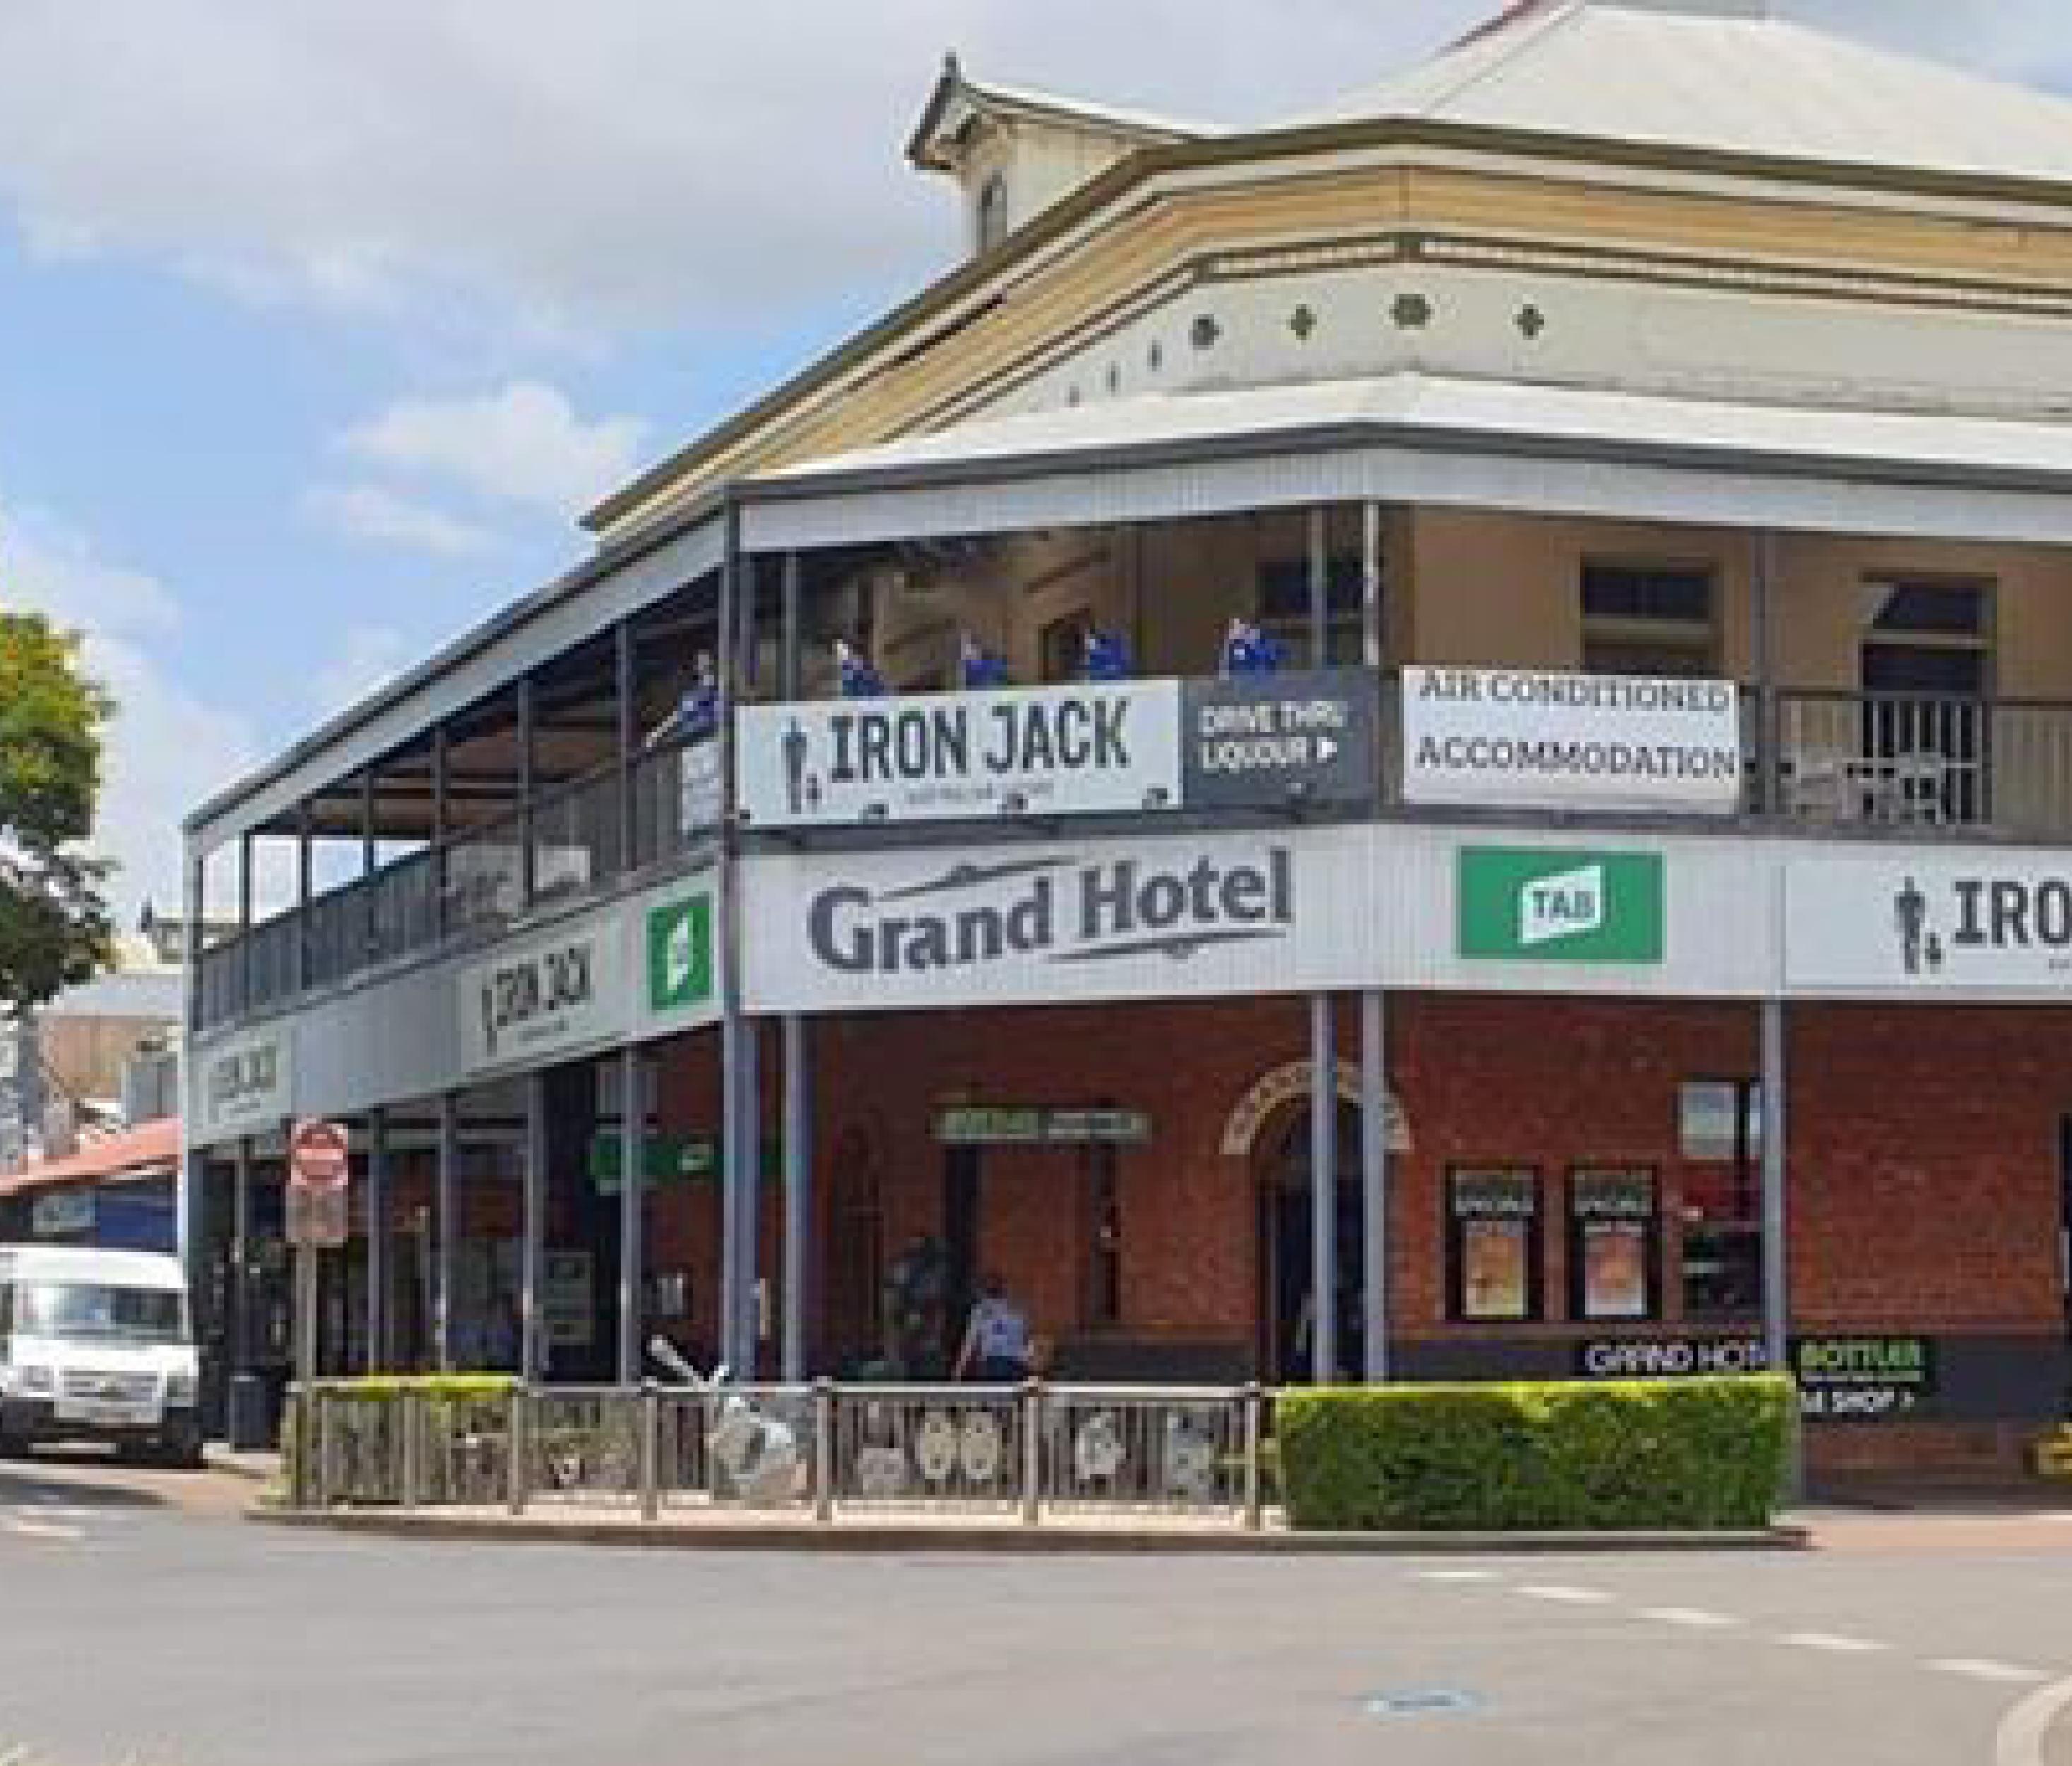 GRAND HOTEL CHILDERS